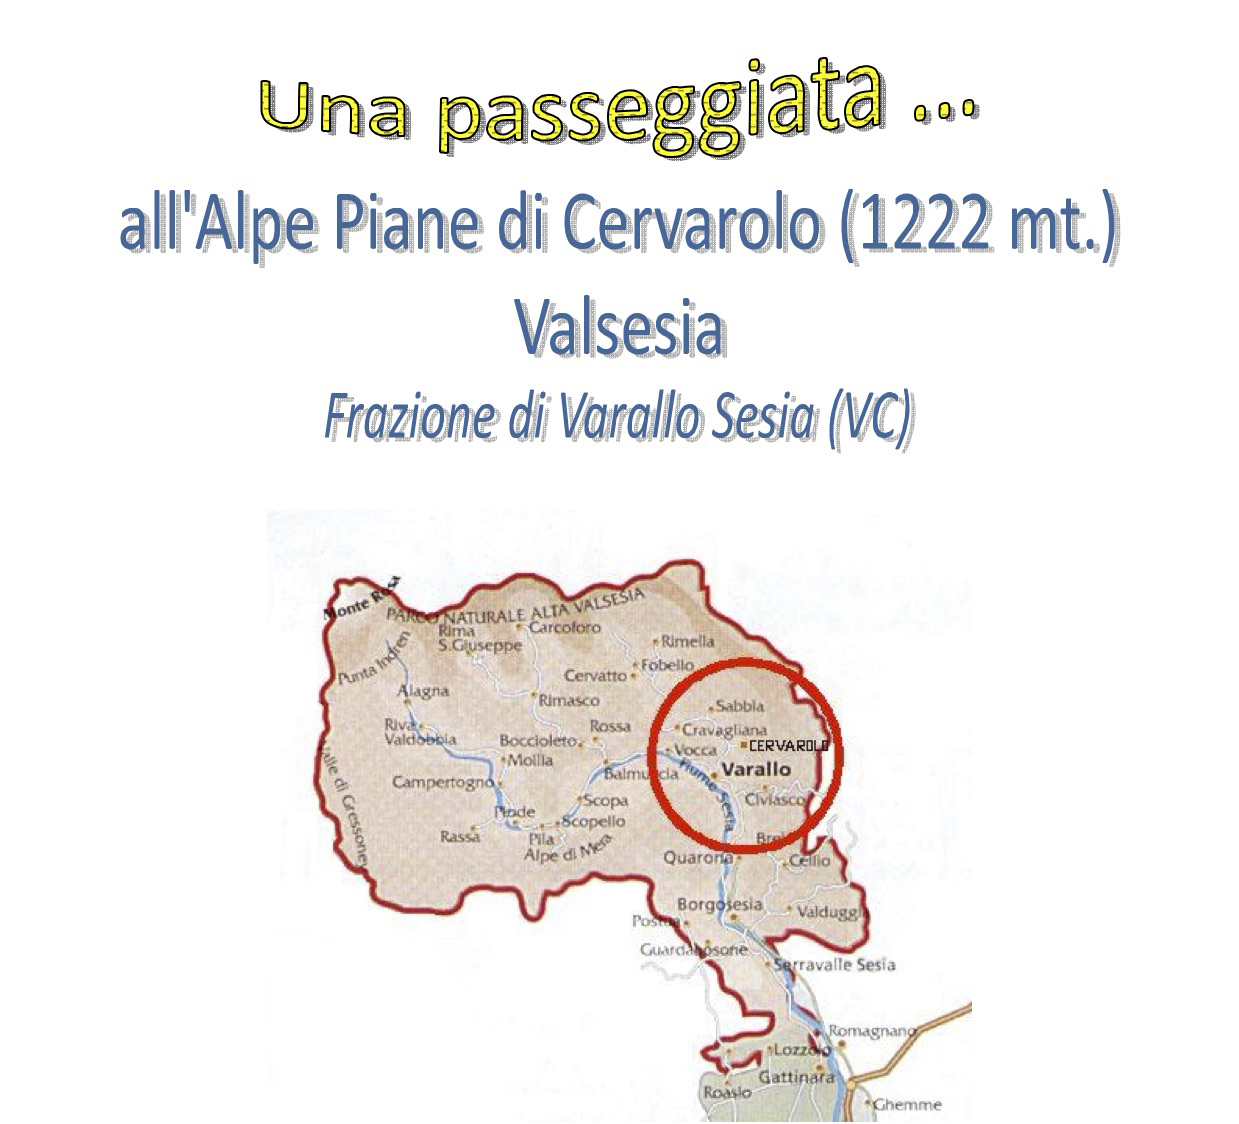 Passeggiata-Alpe Piane_28052016